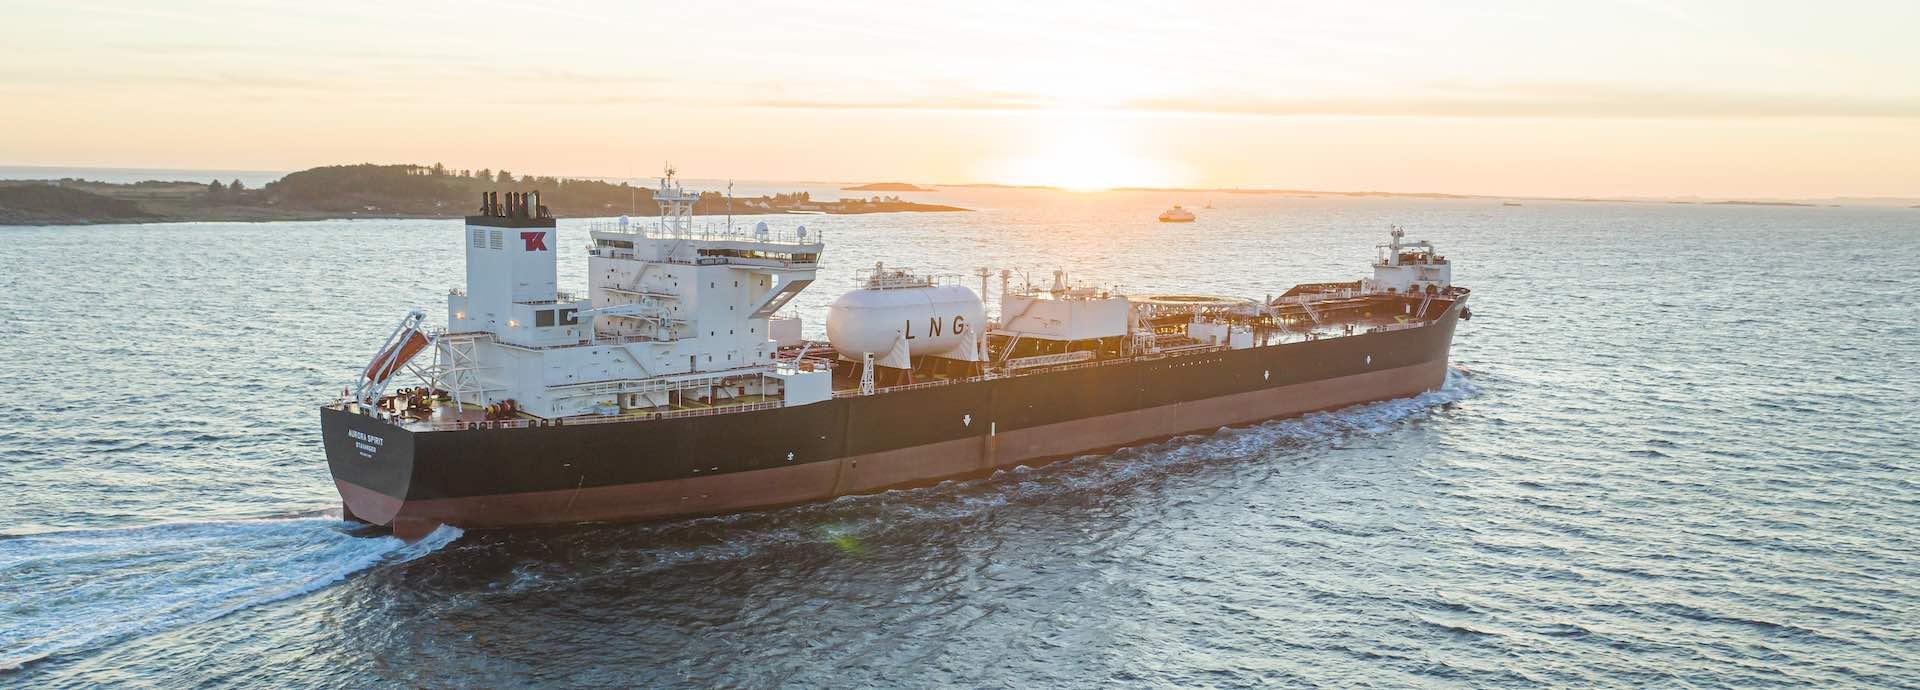 LNG tanker at sea